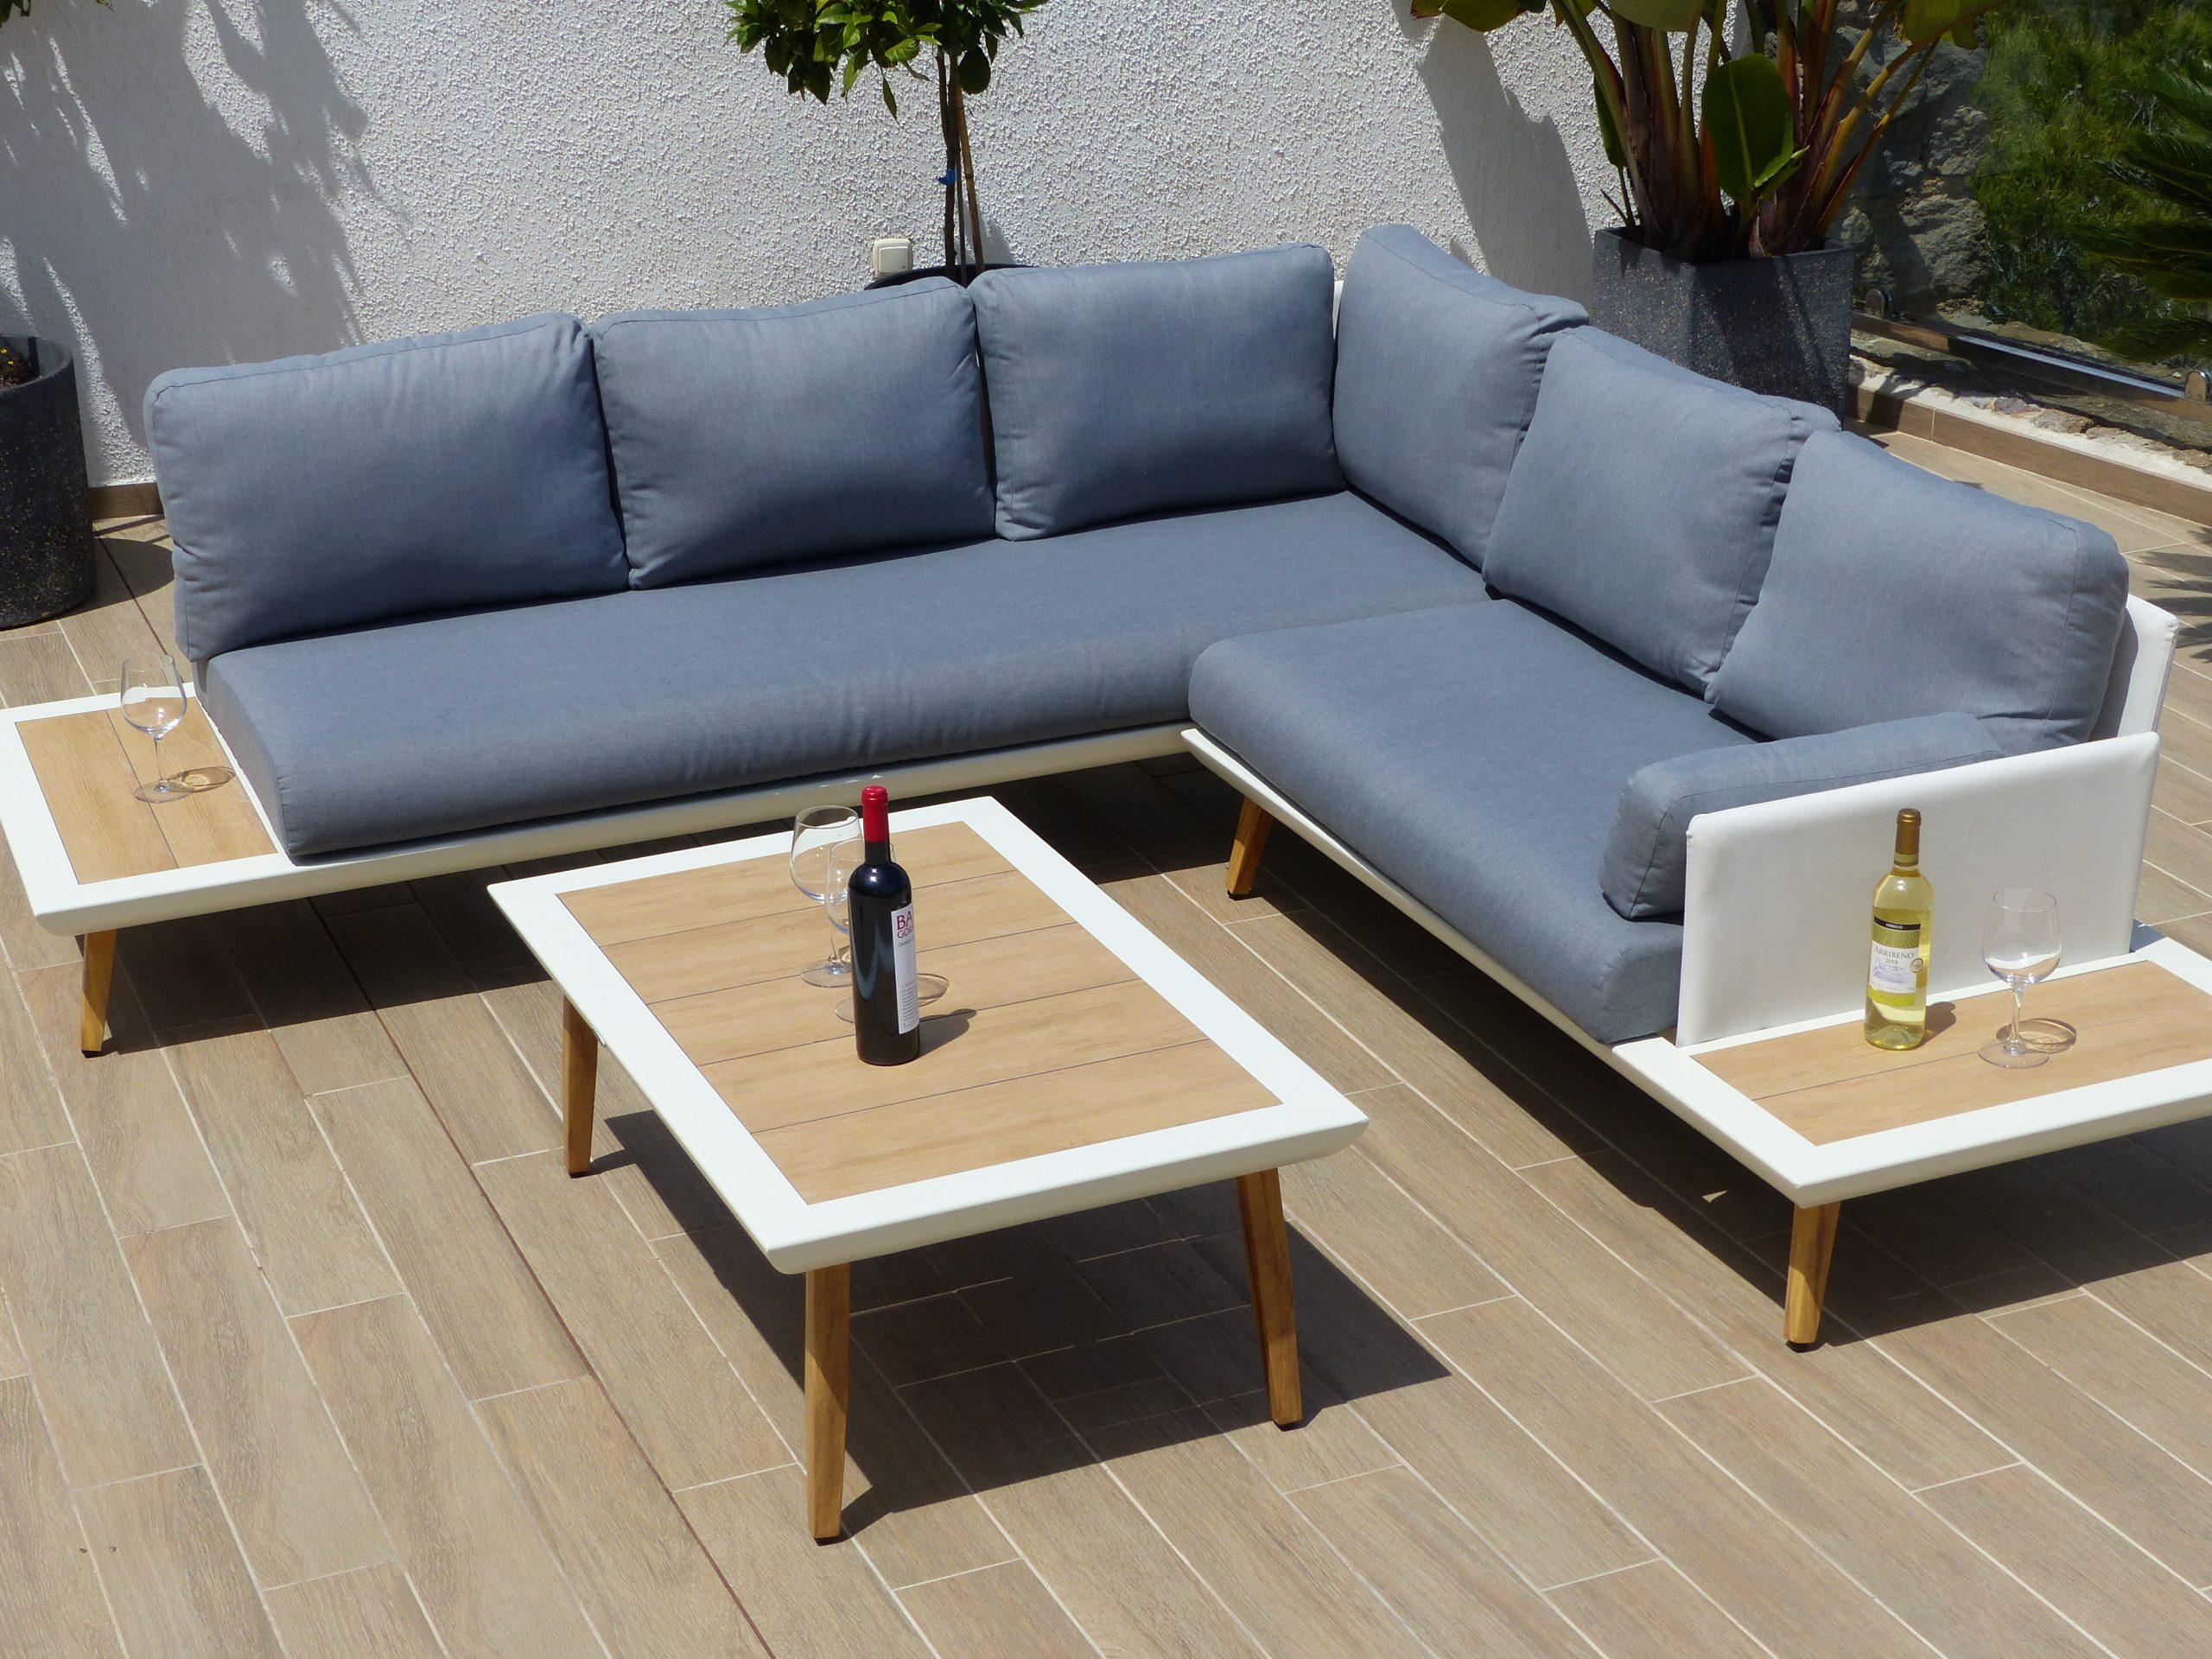 New Oceans Elite Corner Sofa - Romerils